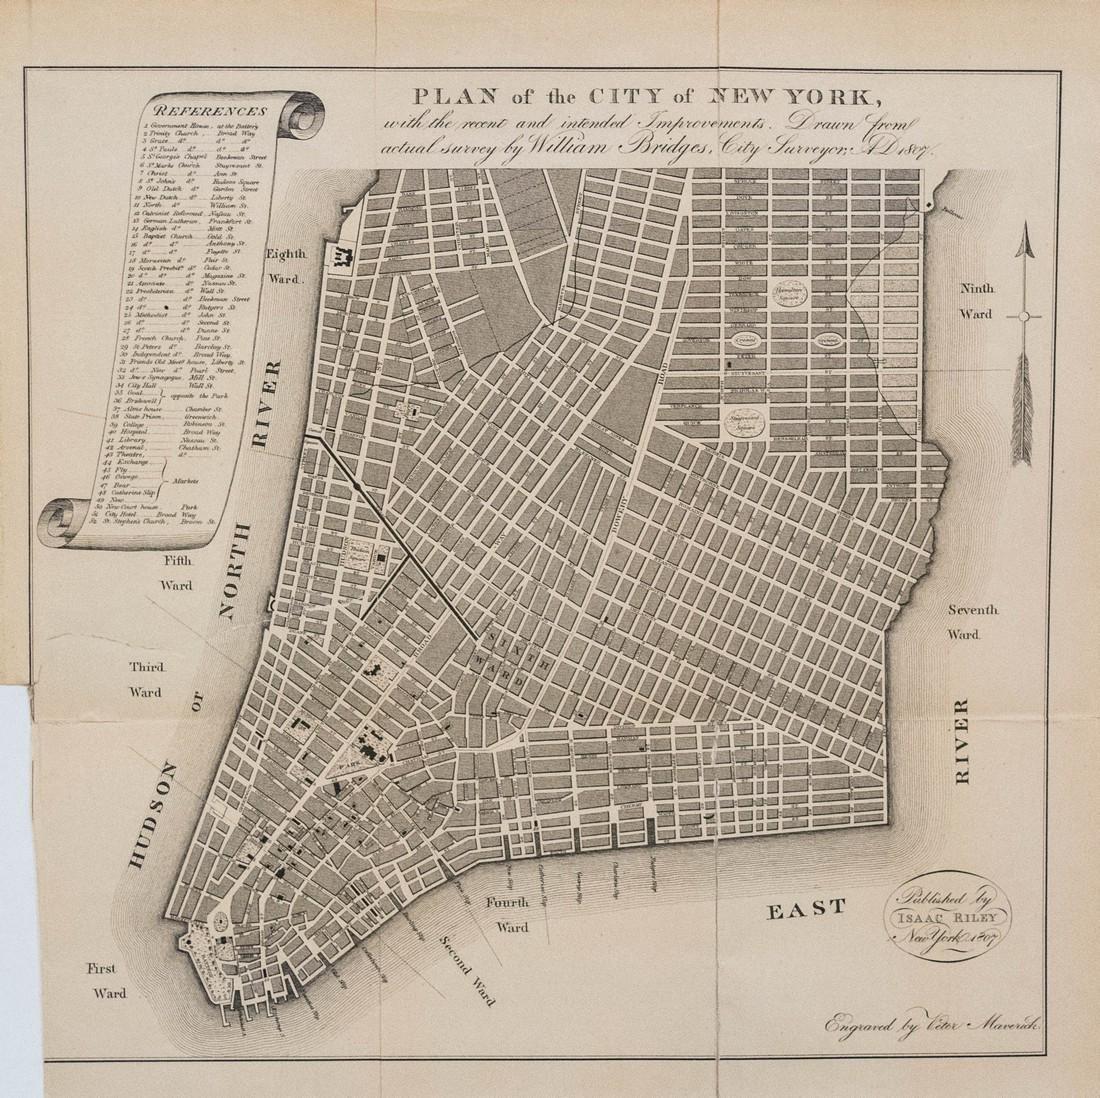 1870 Bridges Plan for New York City